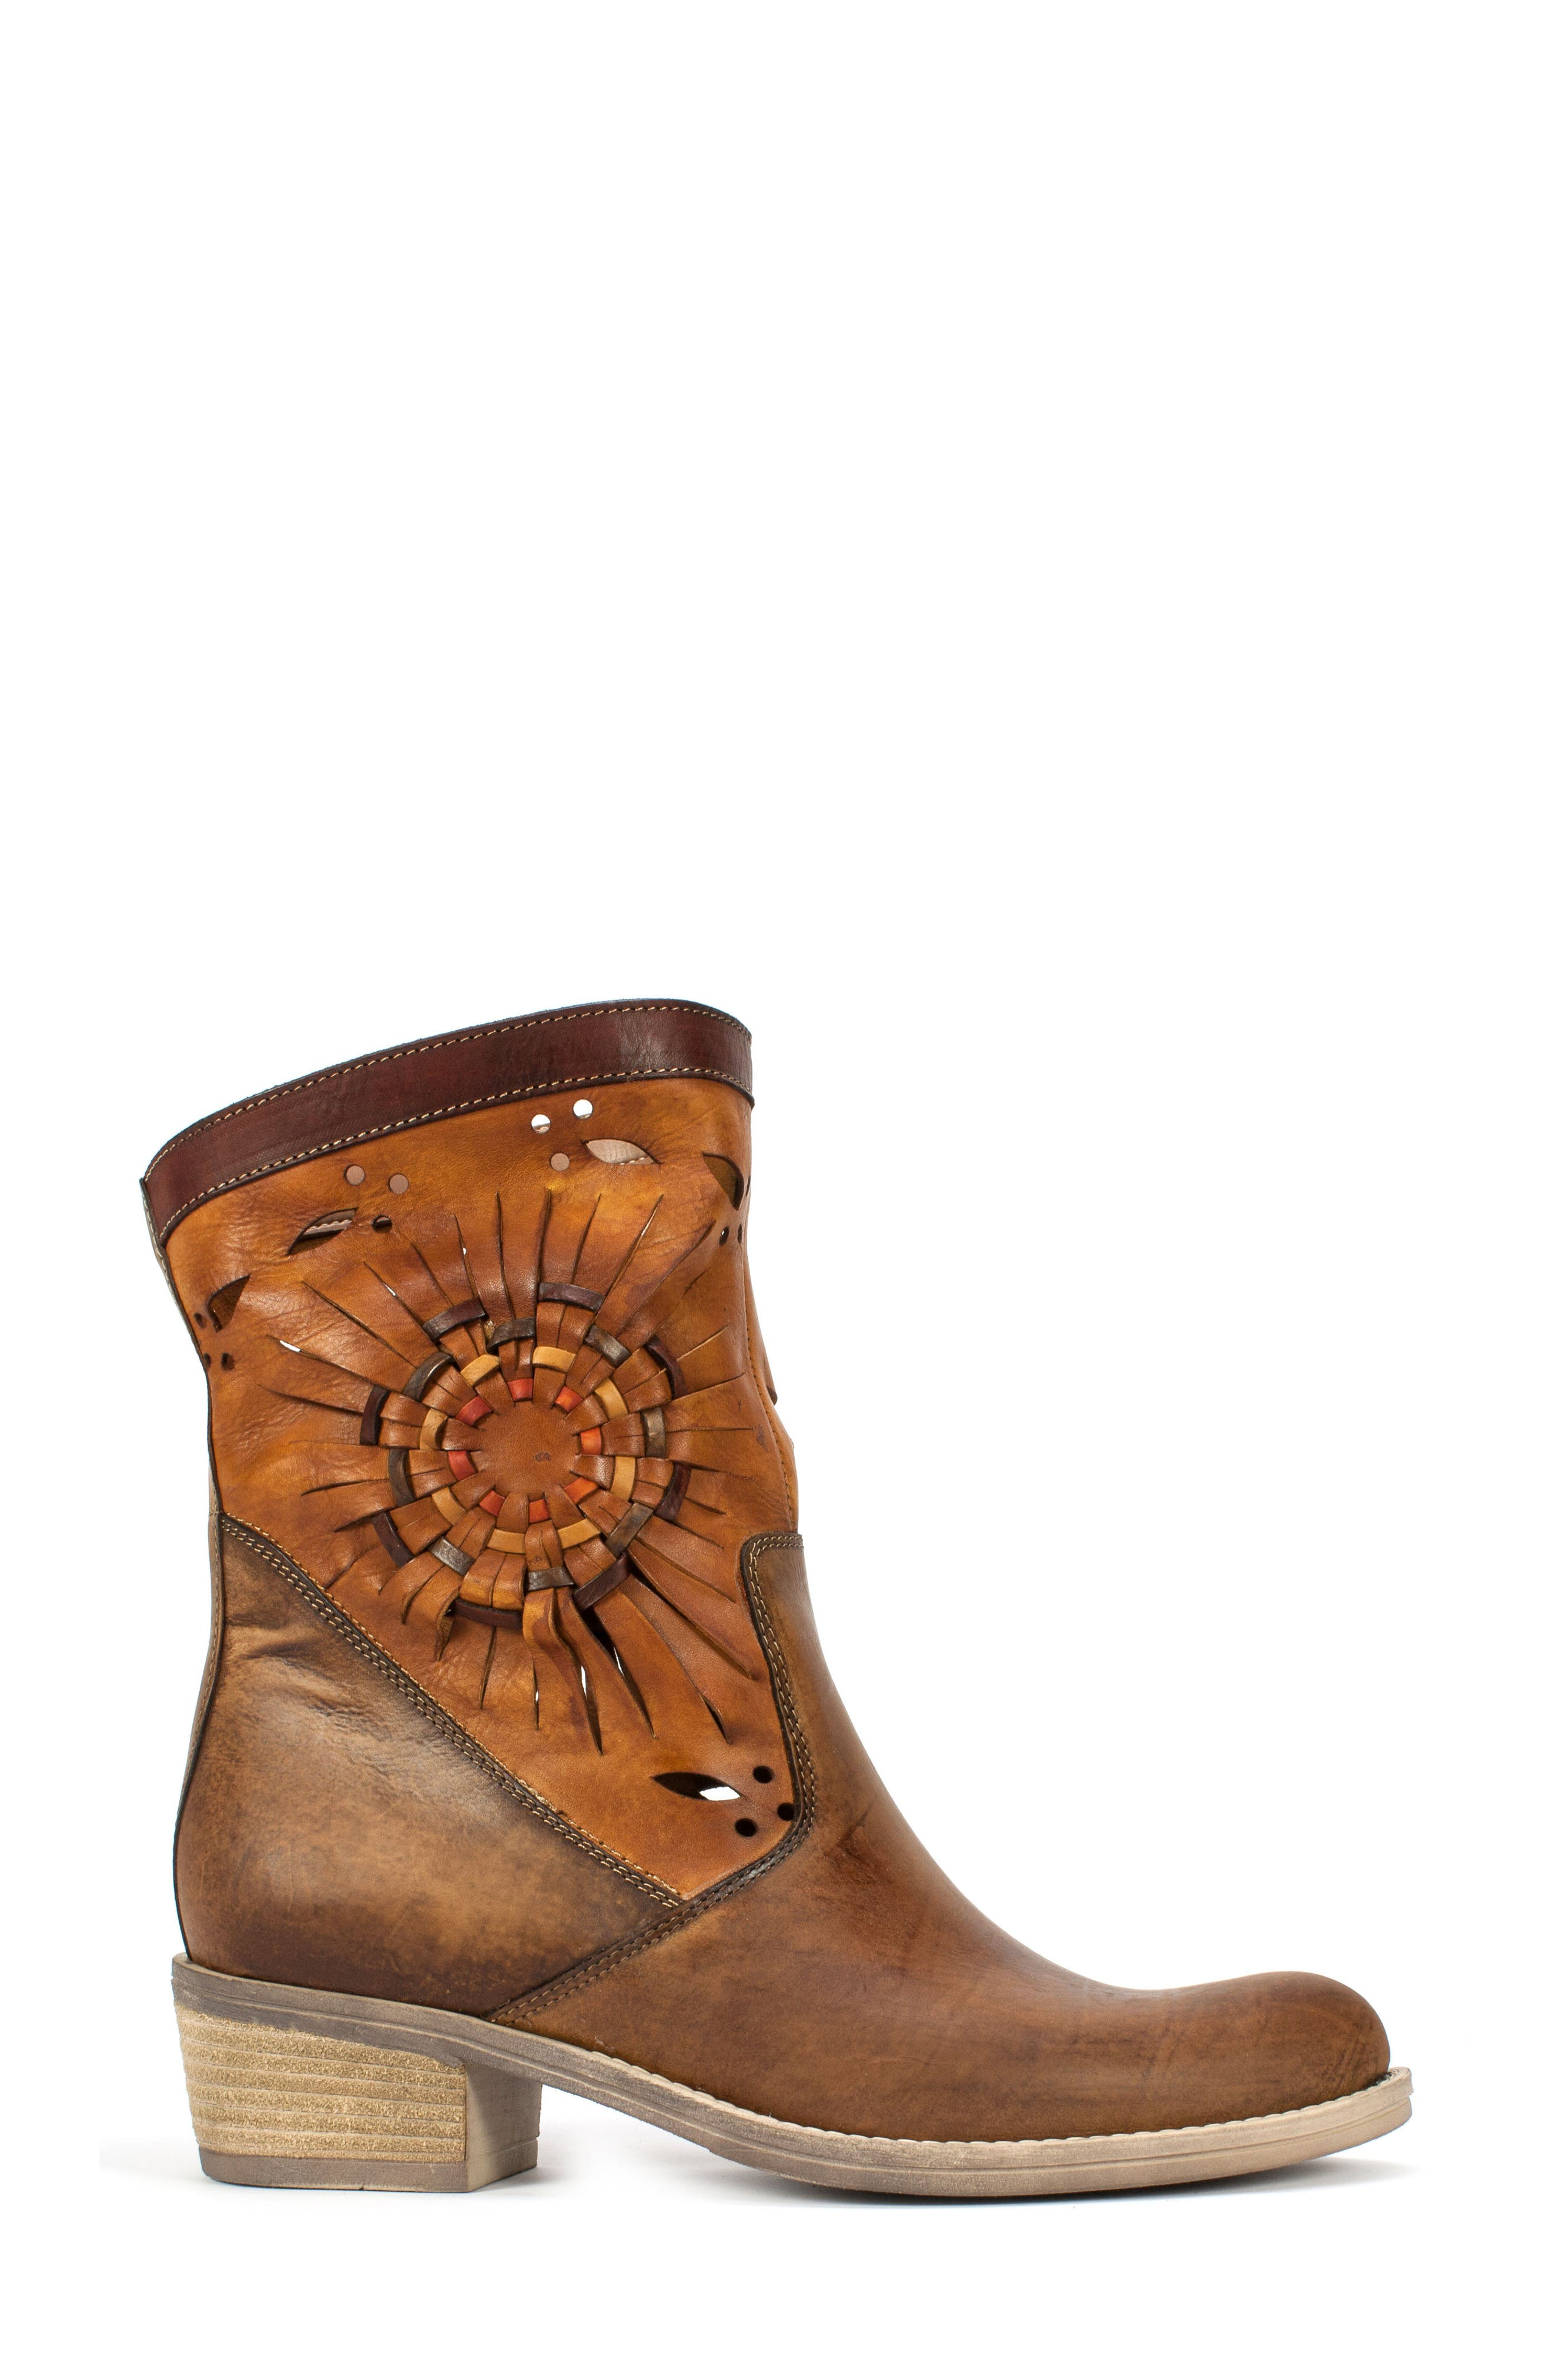 Taryn Woven Sunburst Boot,                             Alternate thumbnail 3, color,                             200